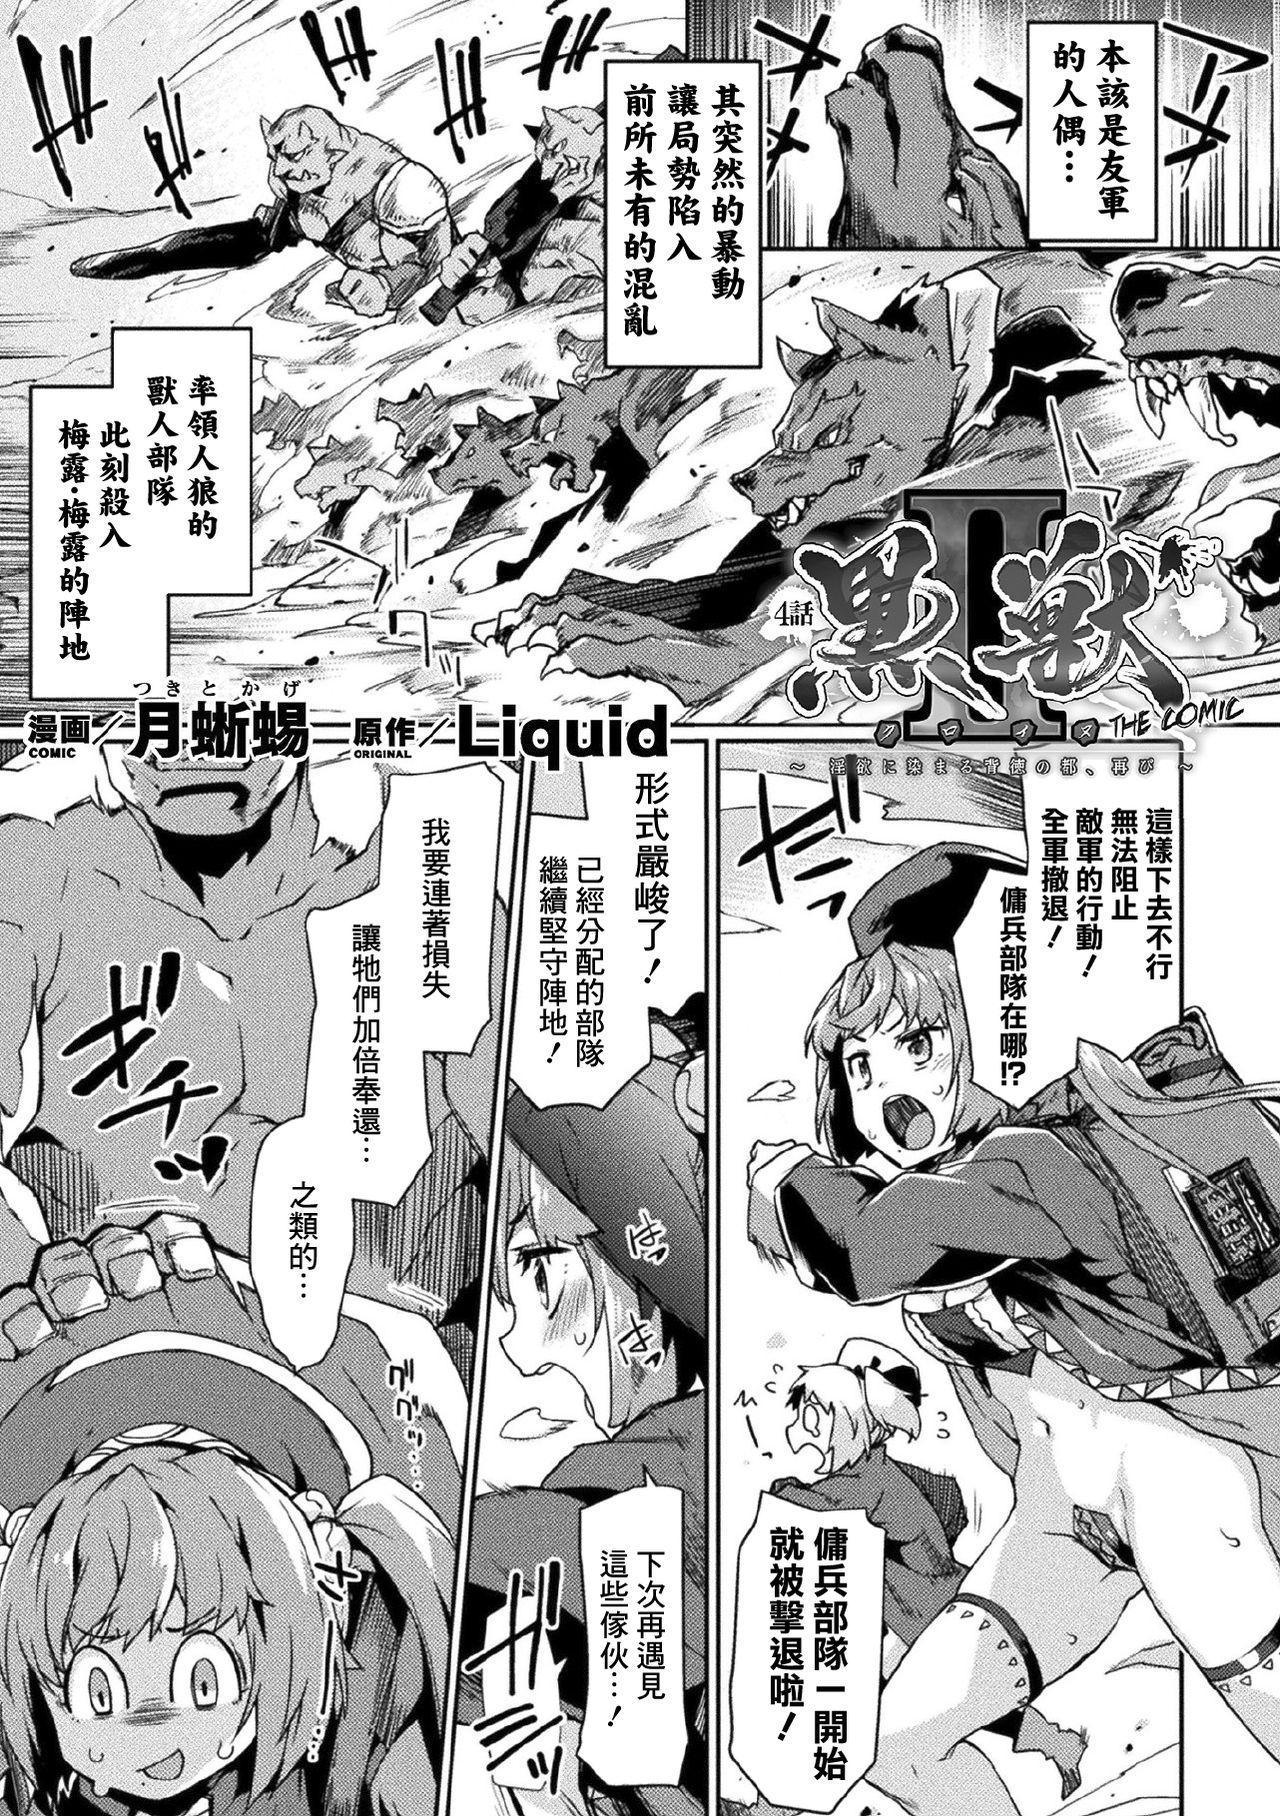 [Tsukitokage] Kuroinu II ~Inyoku ni Somaru Haitoku no Miyako, Futatabi~ THE COMIC Ch. 4 (Kukkoro Heroines Vol. 3) [Chinese] [鬼畜王漢化組] [Digital] 1